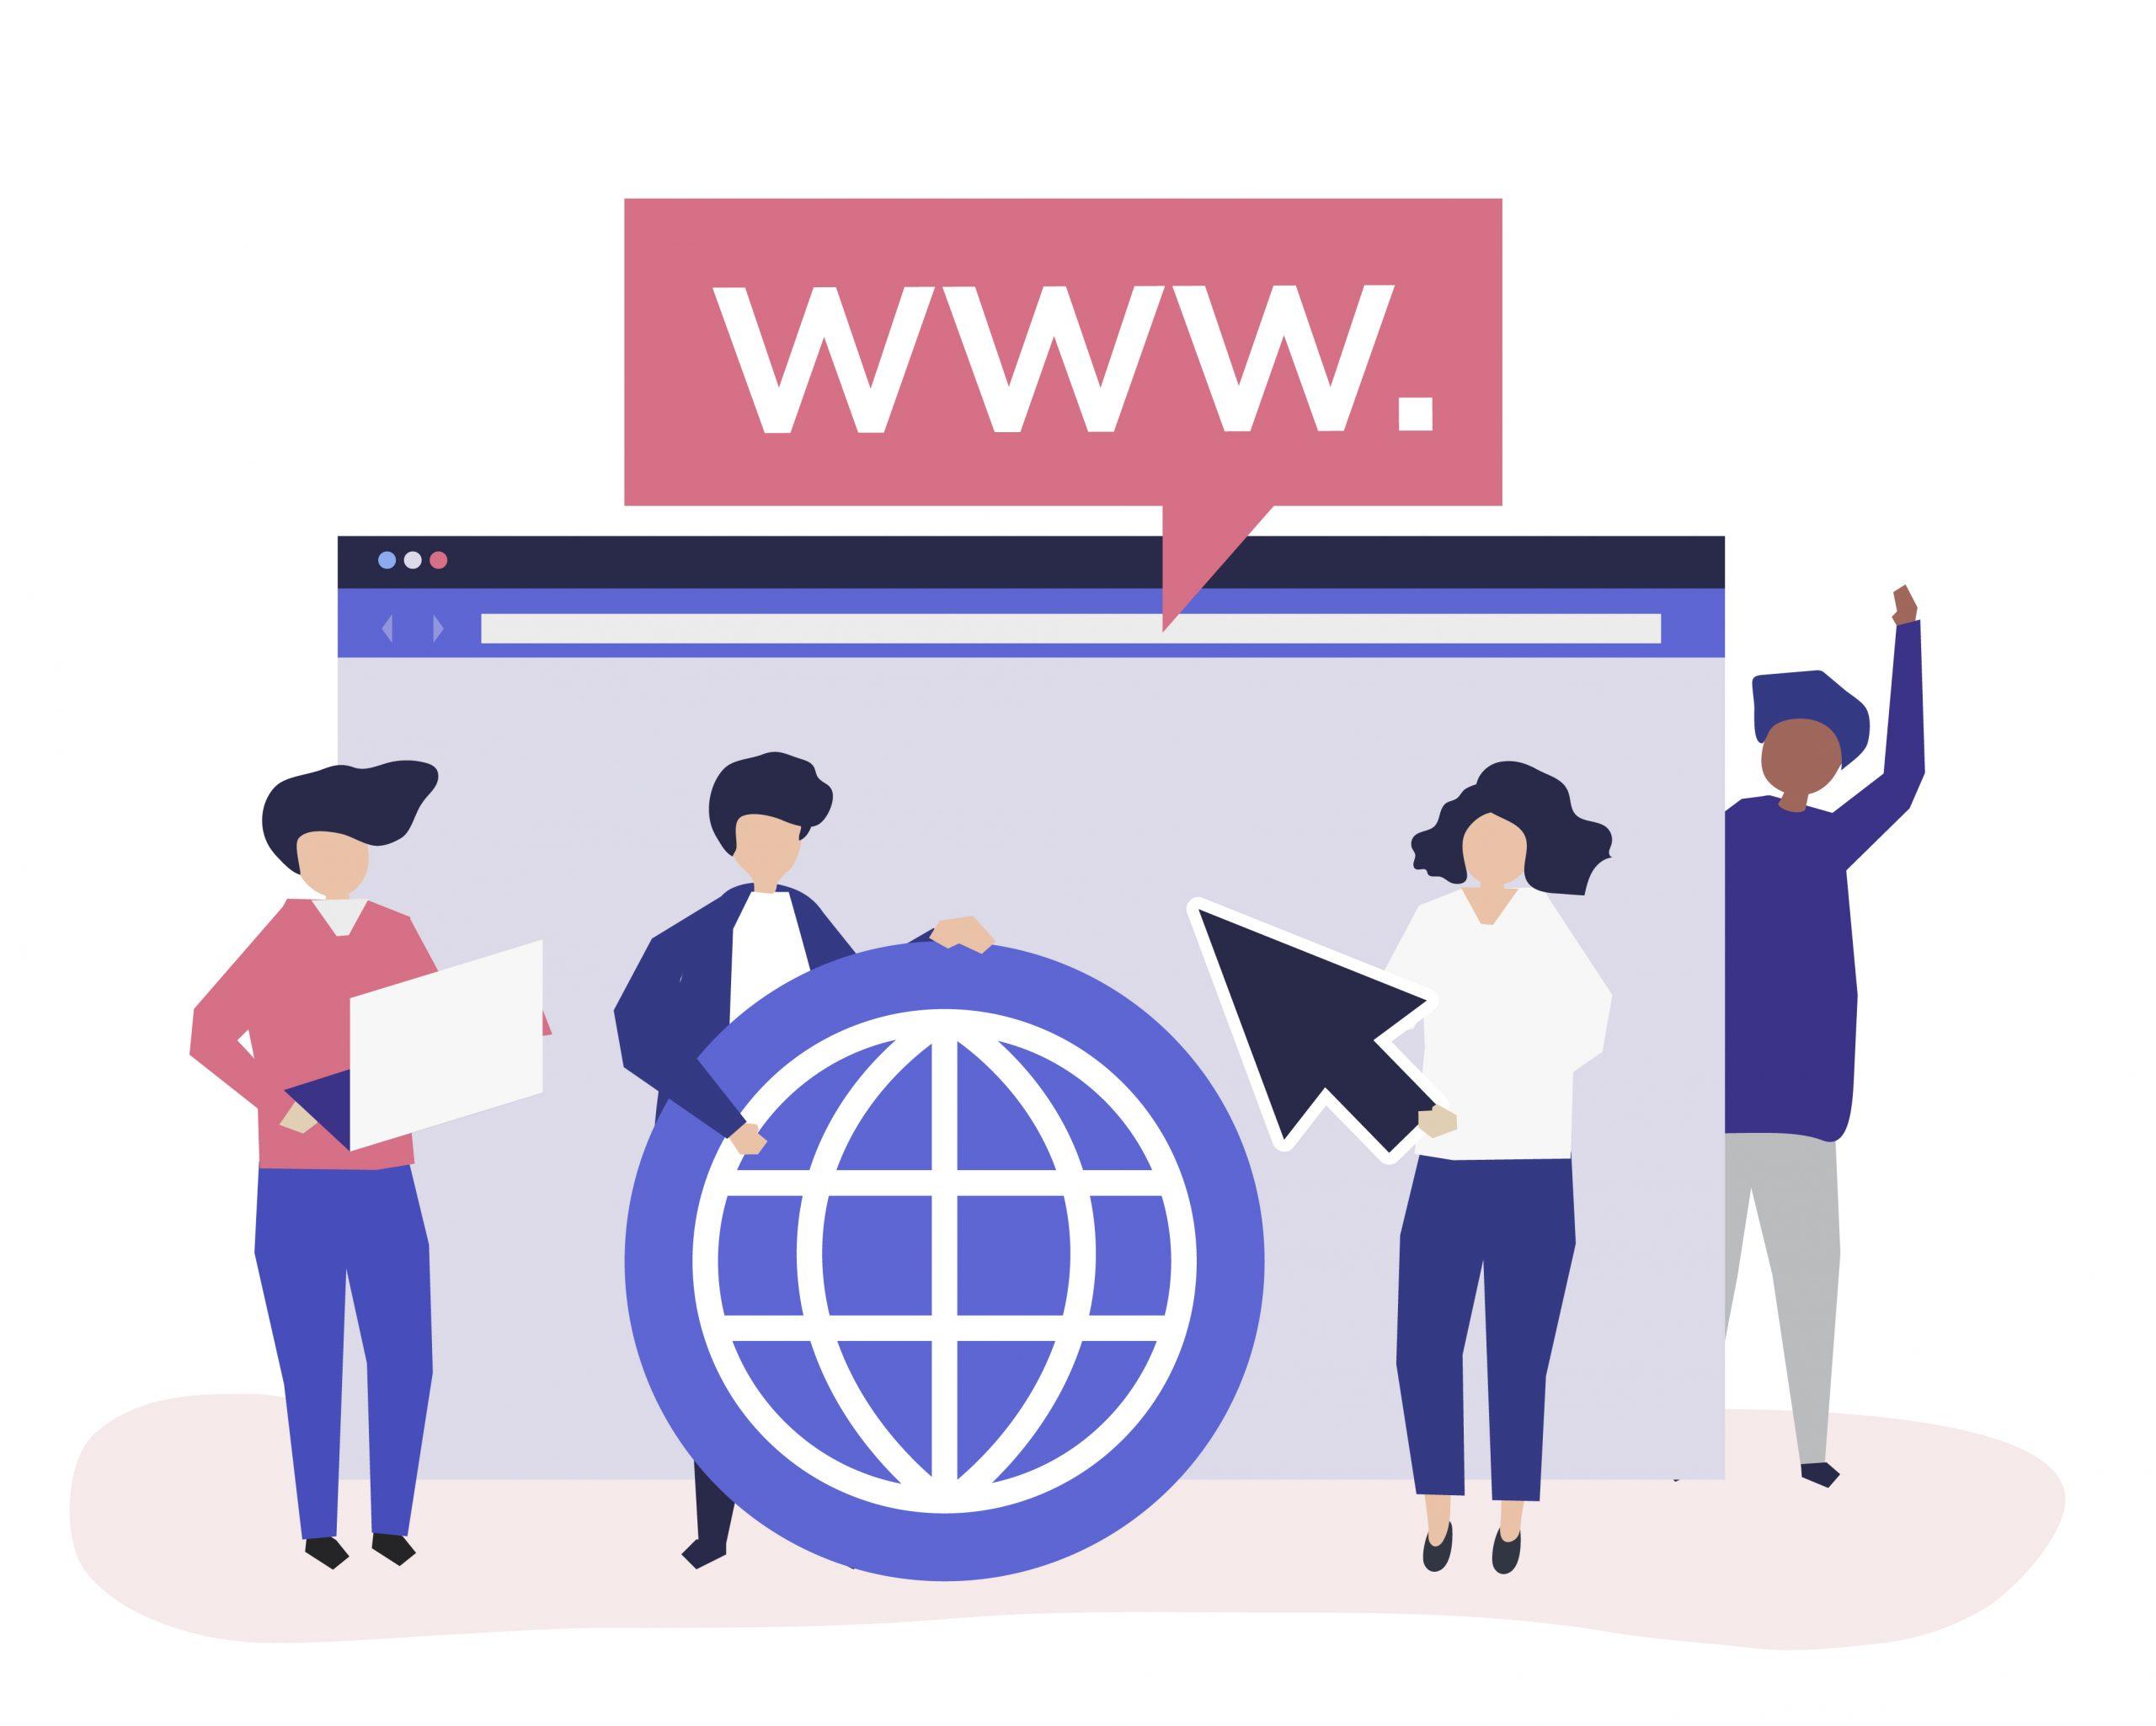 Saiba mais sobre Marketplace – vale a pena participar?